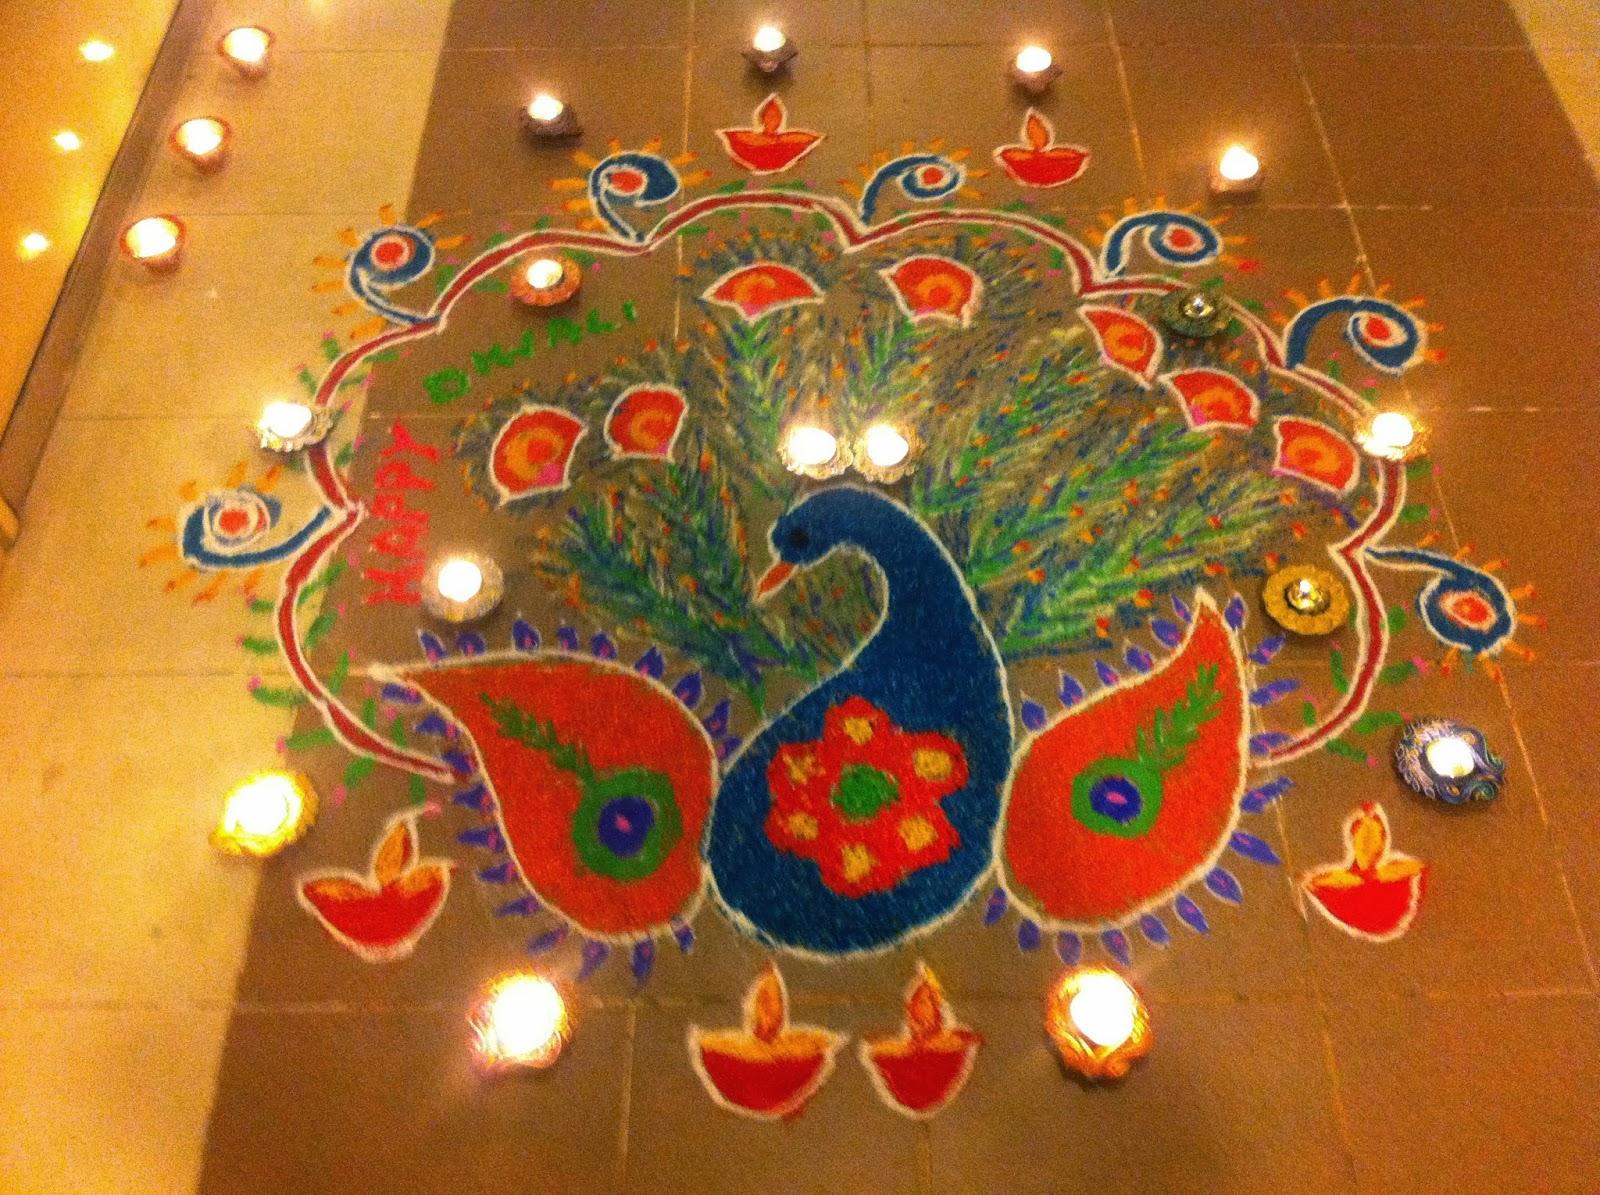 Hot Girl Wallpaper Diwali Rangoli Hd Wallpaper Free-2738